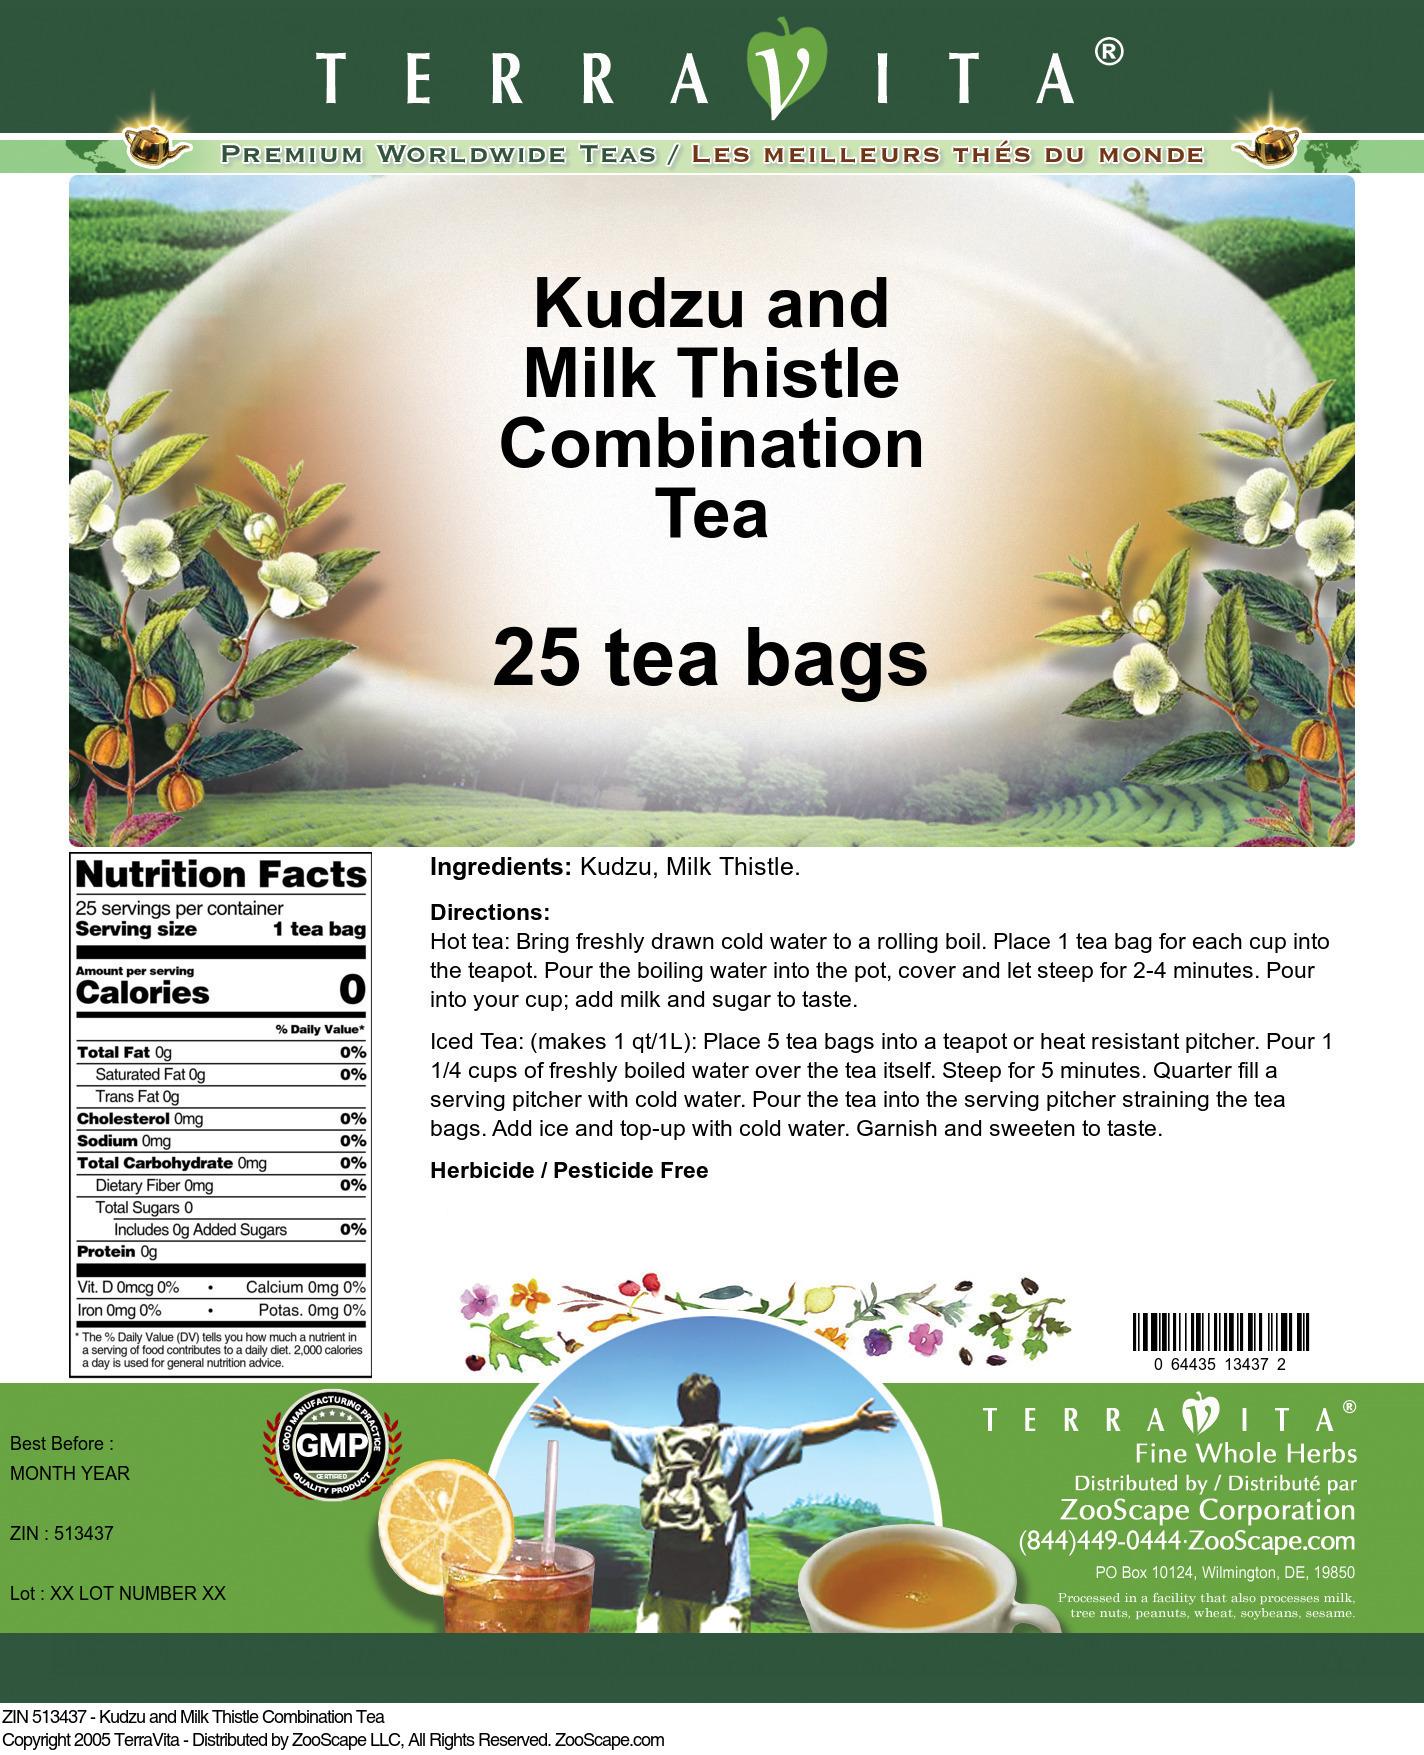 Kudzu and Milk Thistle Combination Tea